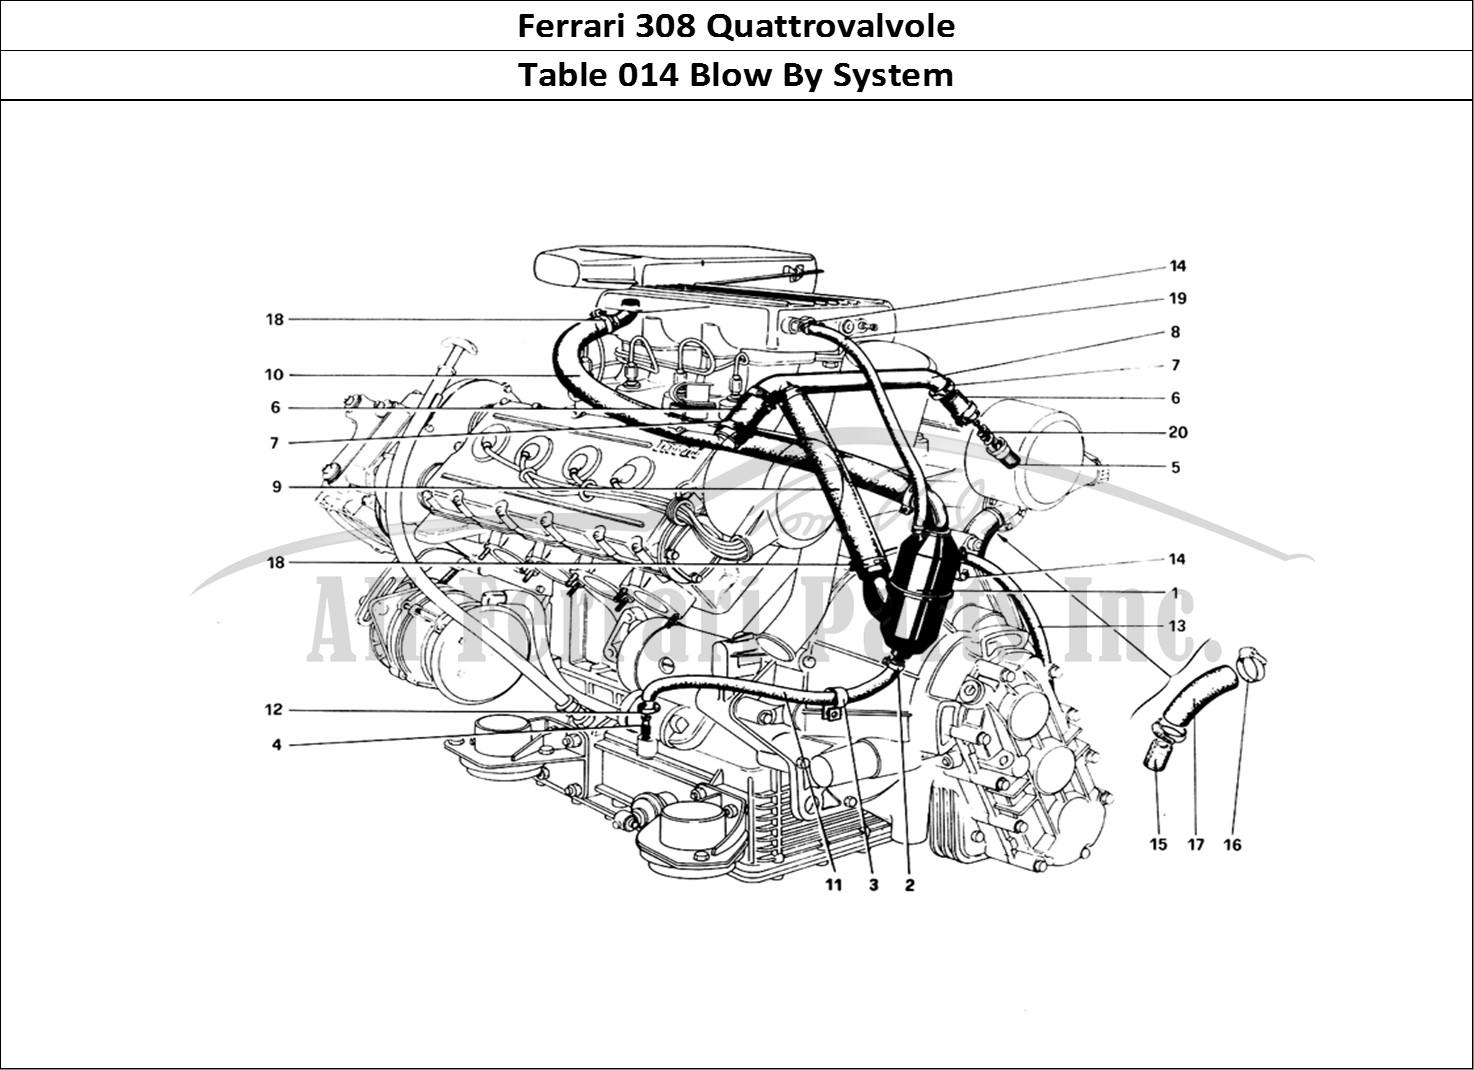 ferrari 308 gtb 1980 blow by system 308 gtb diagram